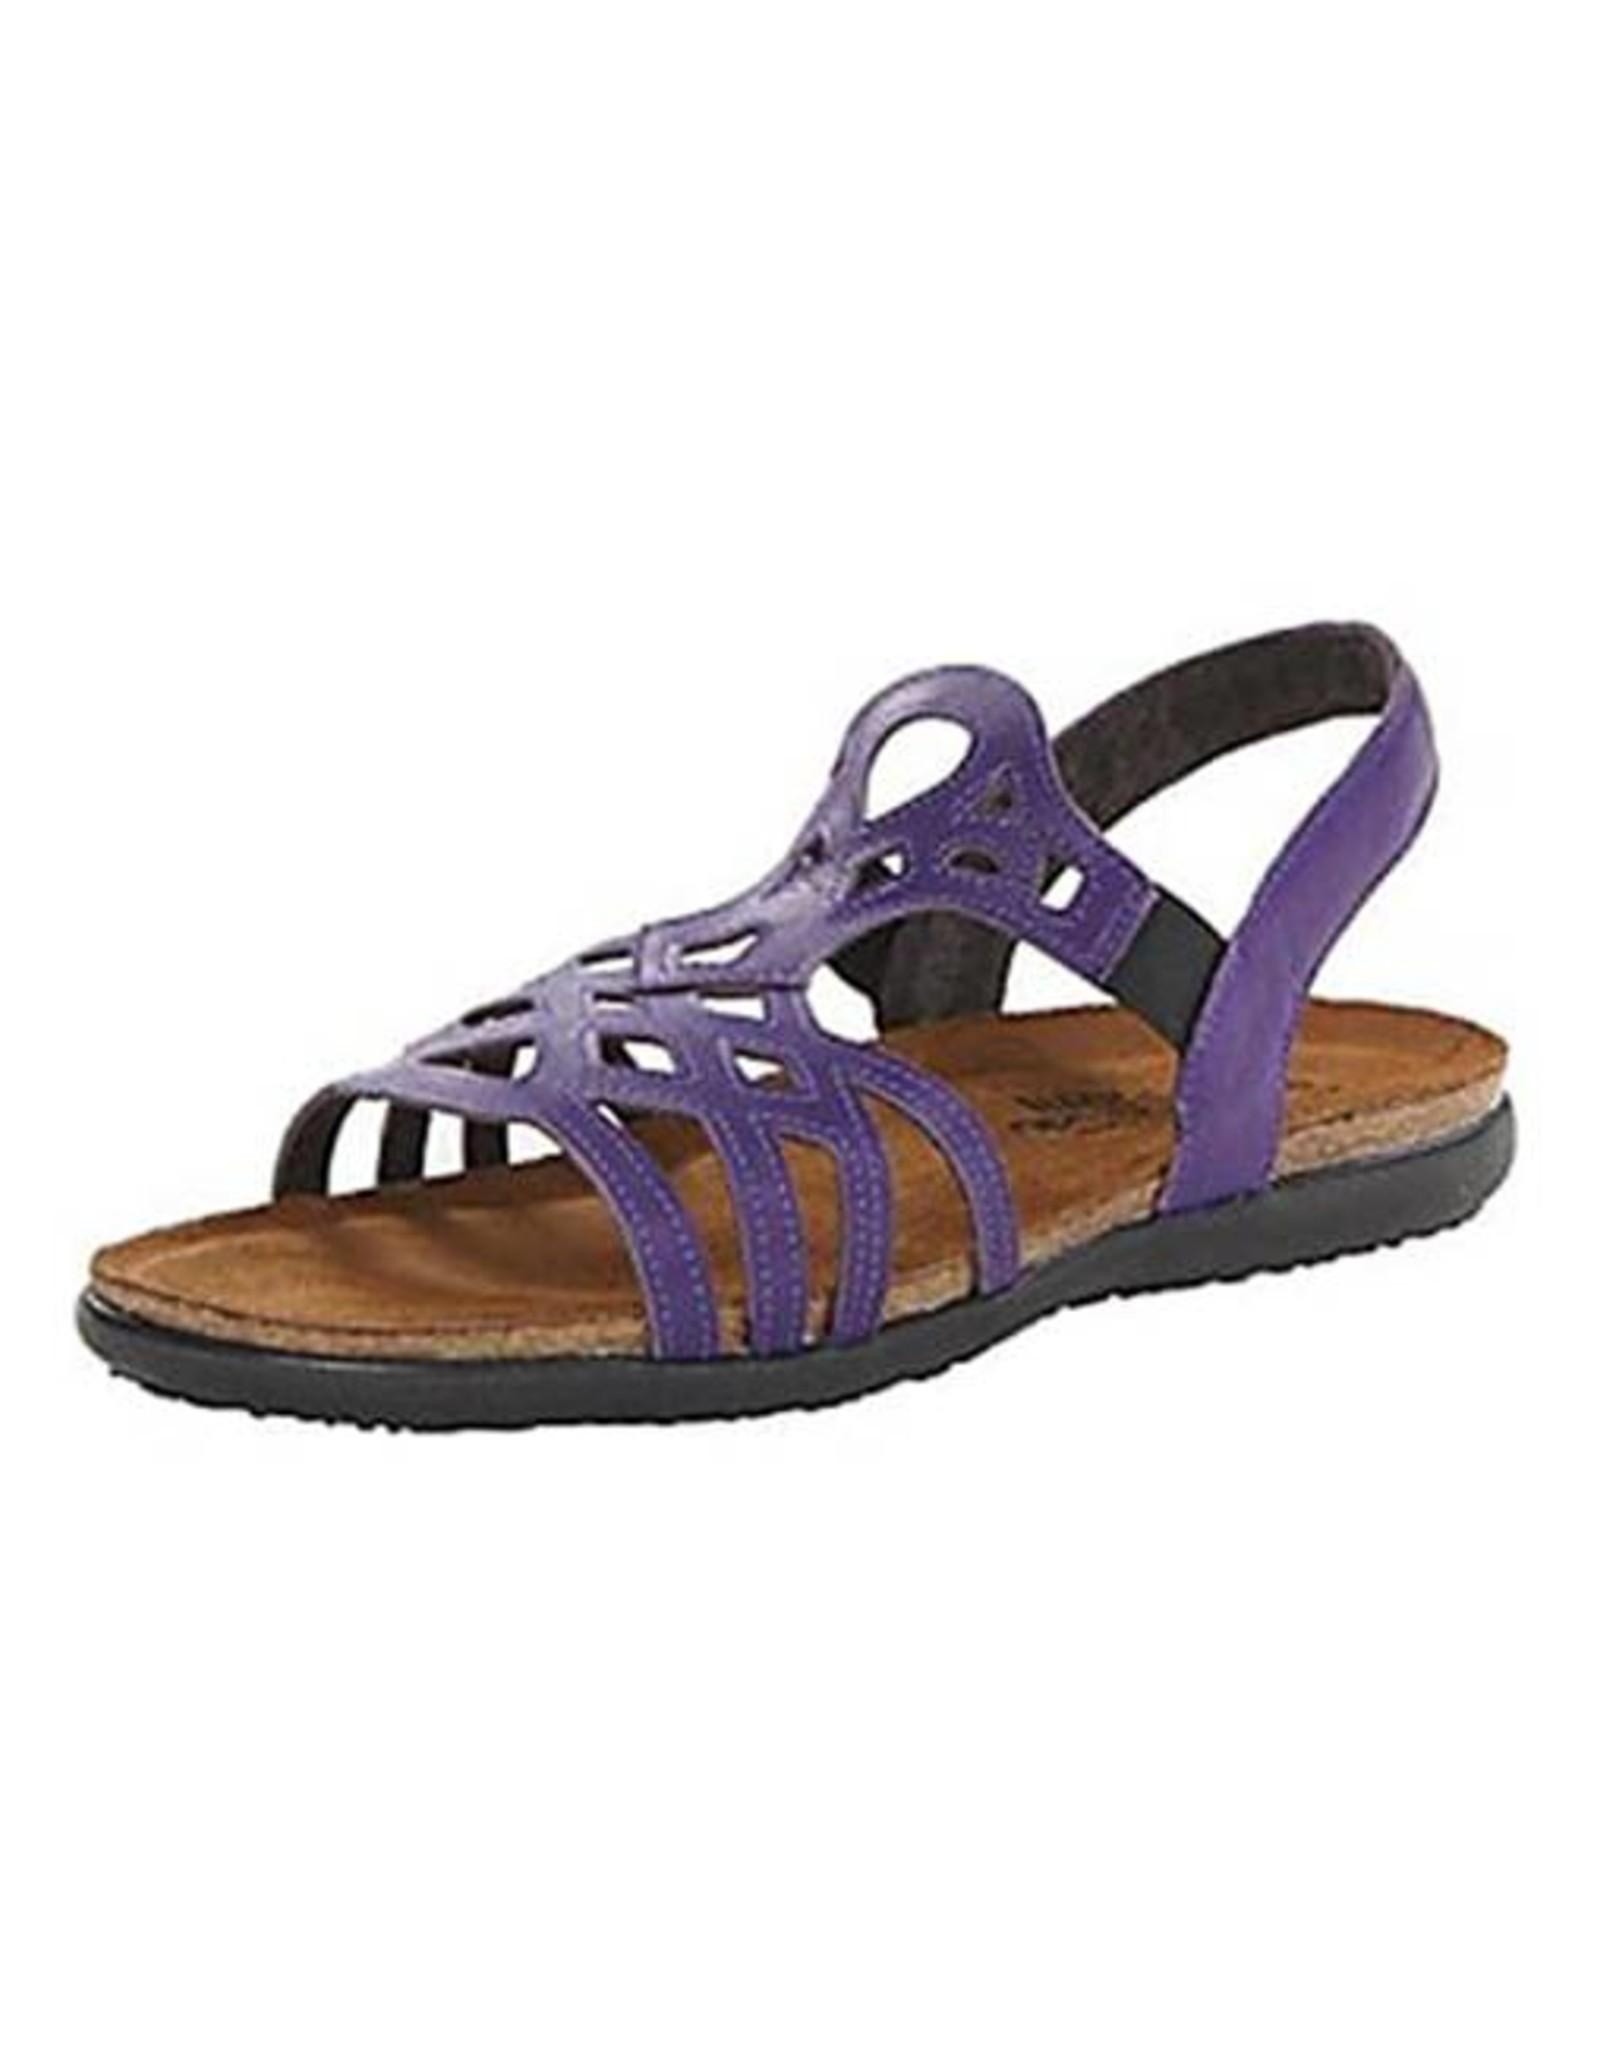 Naot Footwear Rebecca in Fiji Purple